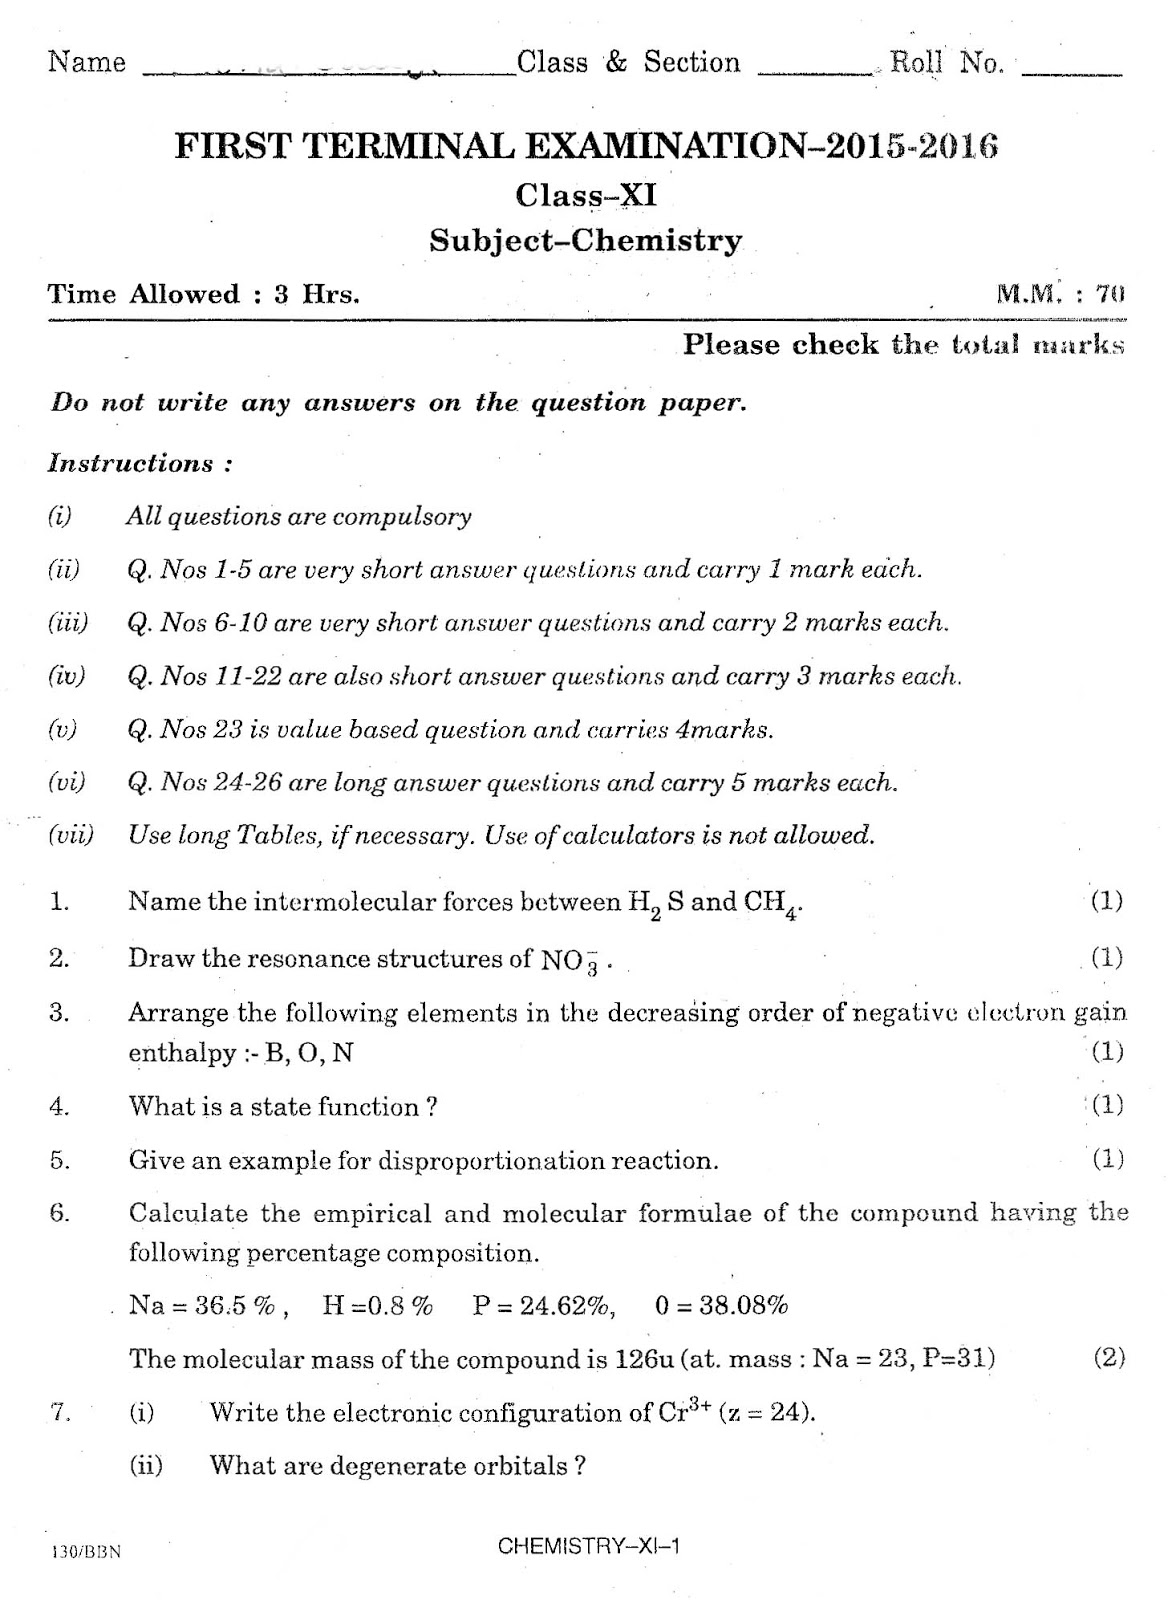 Science4all class xi chemistry birla vidya niketan school question class xi chemistry birla vidya niketan school question paper 2015 2016 malvernweather Image collections